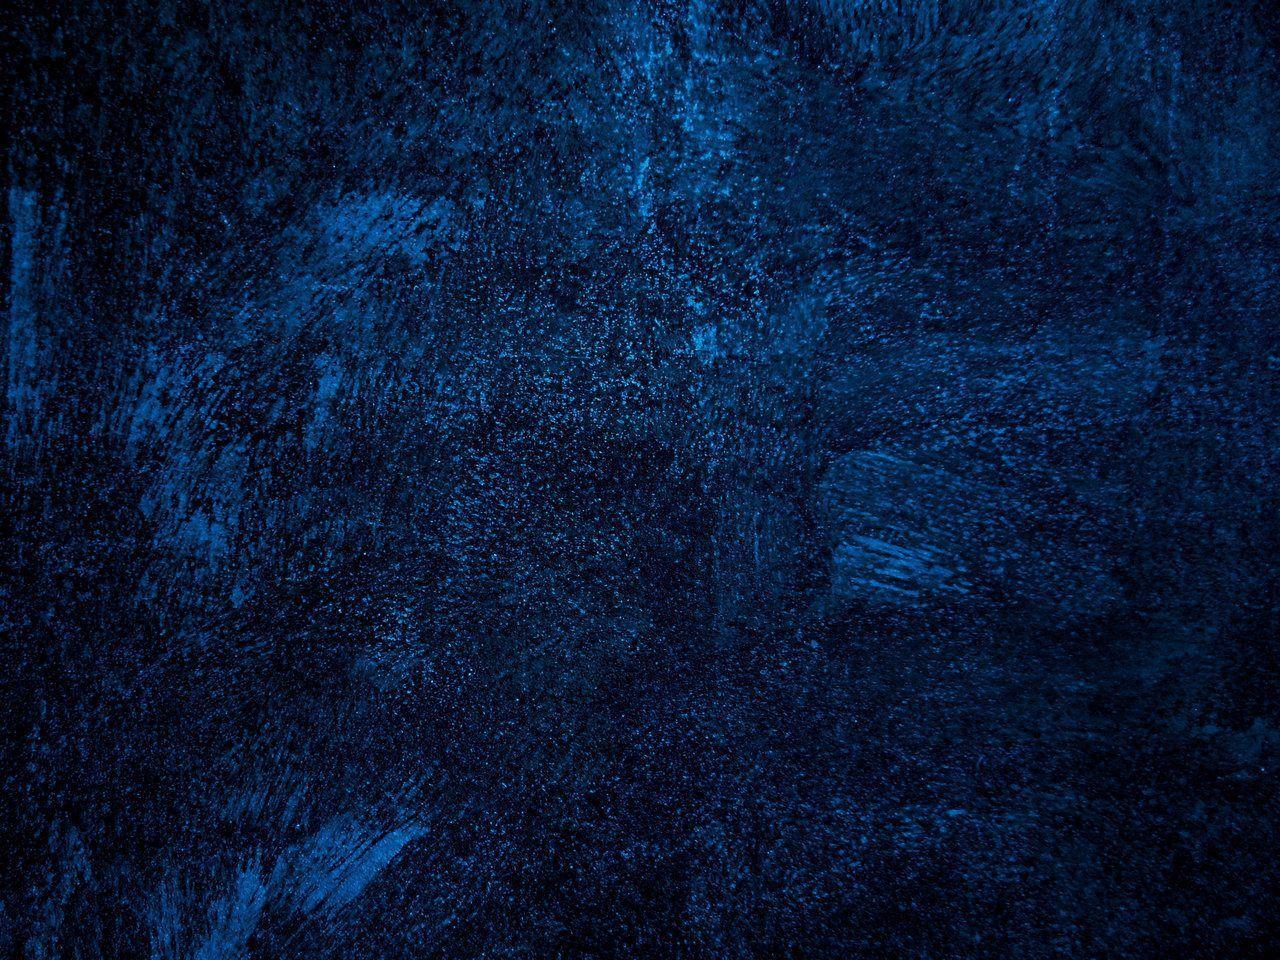 Beautiful Wallpaper Marble Navy Blue - e66c4432750e317c1eea08e88f3f58cf  2018_603088.jpg